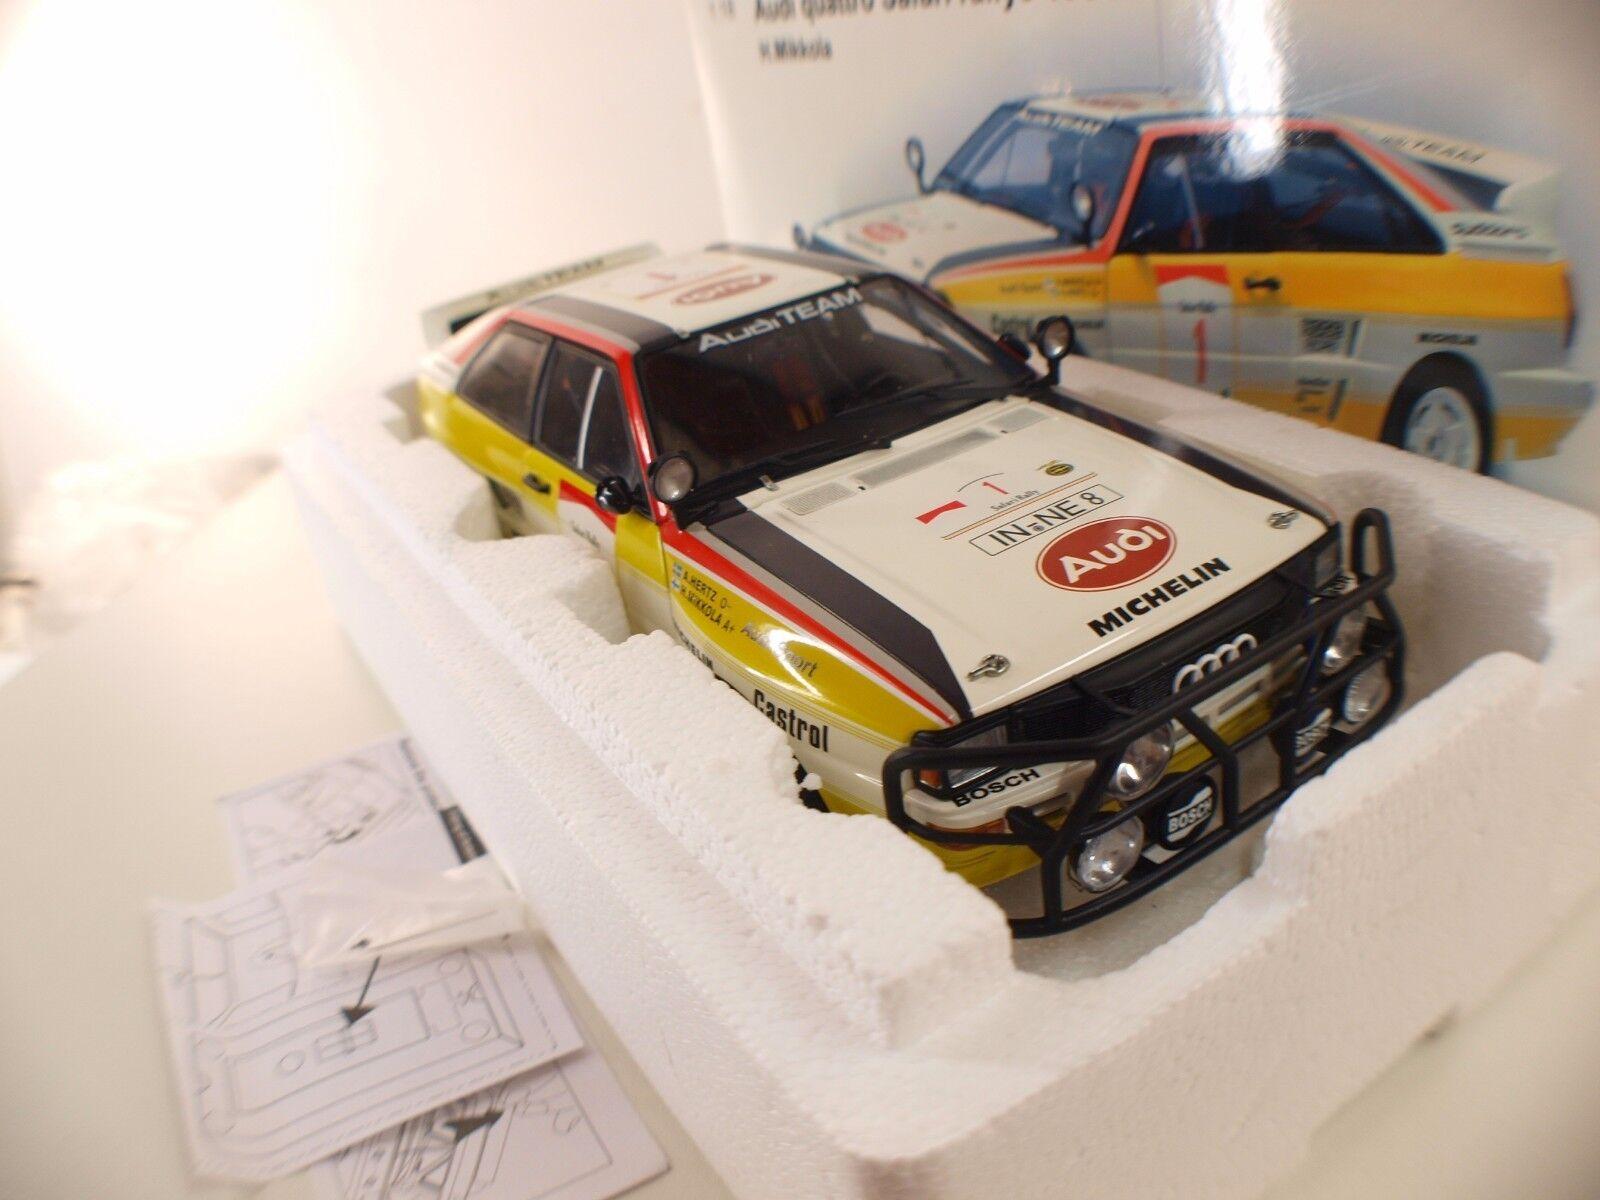 Autoart n° 88401i Quattro Safari Rallye  1 1984 1 18 neuf boîte  boxed mint